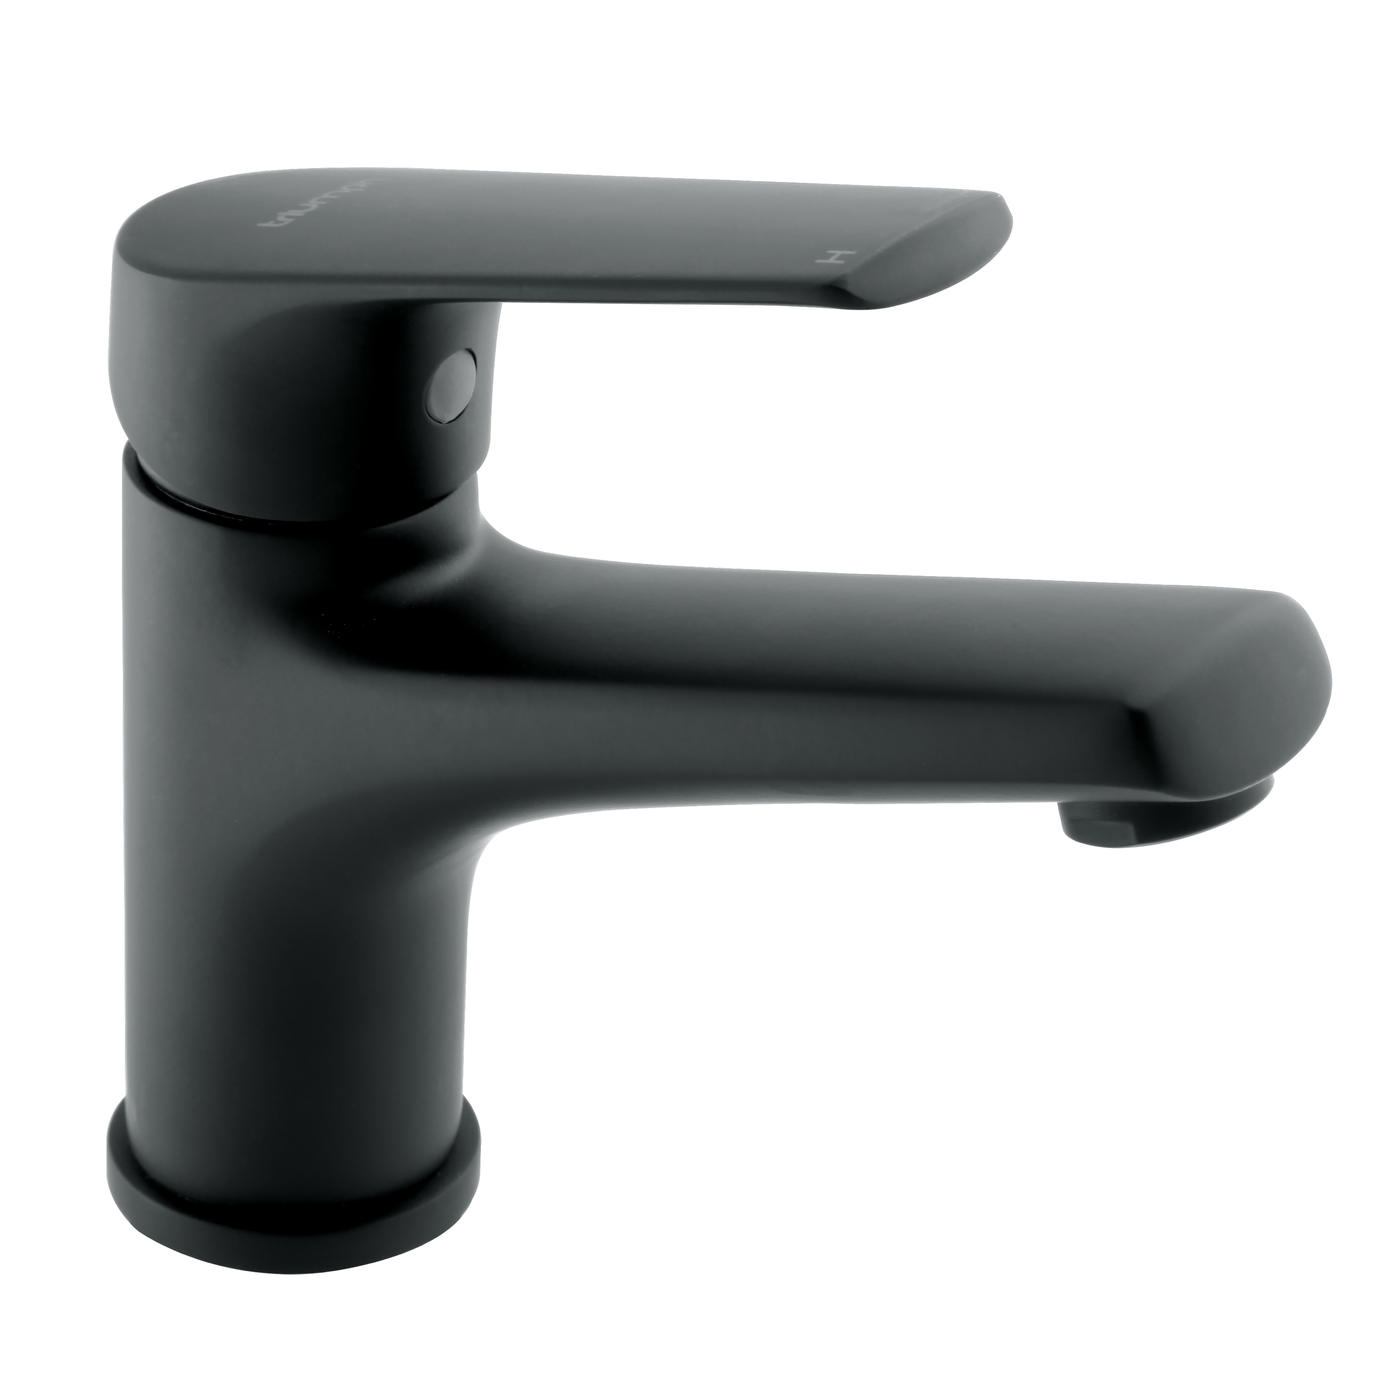 Bathroom Faucets Bathroom Leroy Merlin South Africa